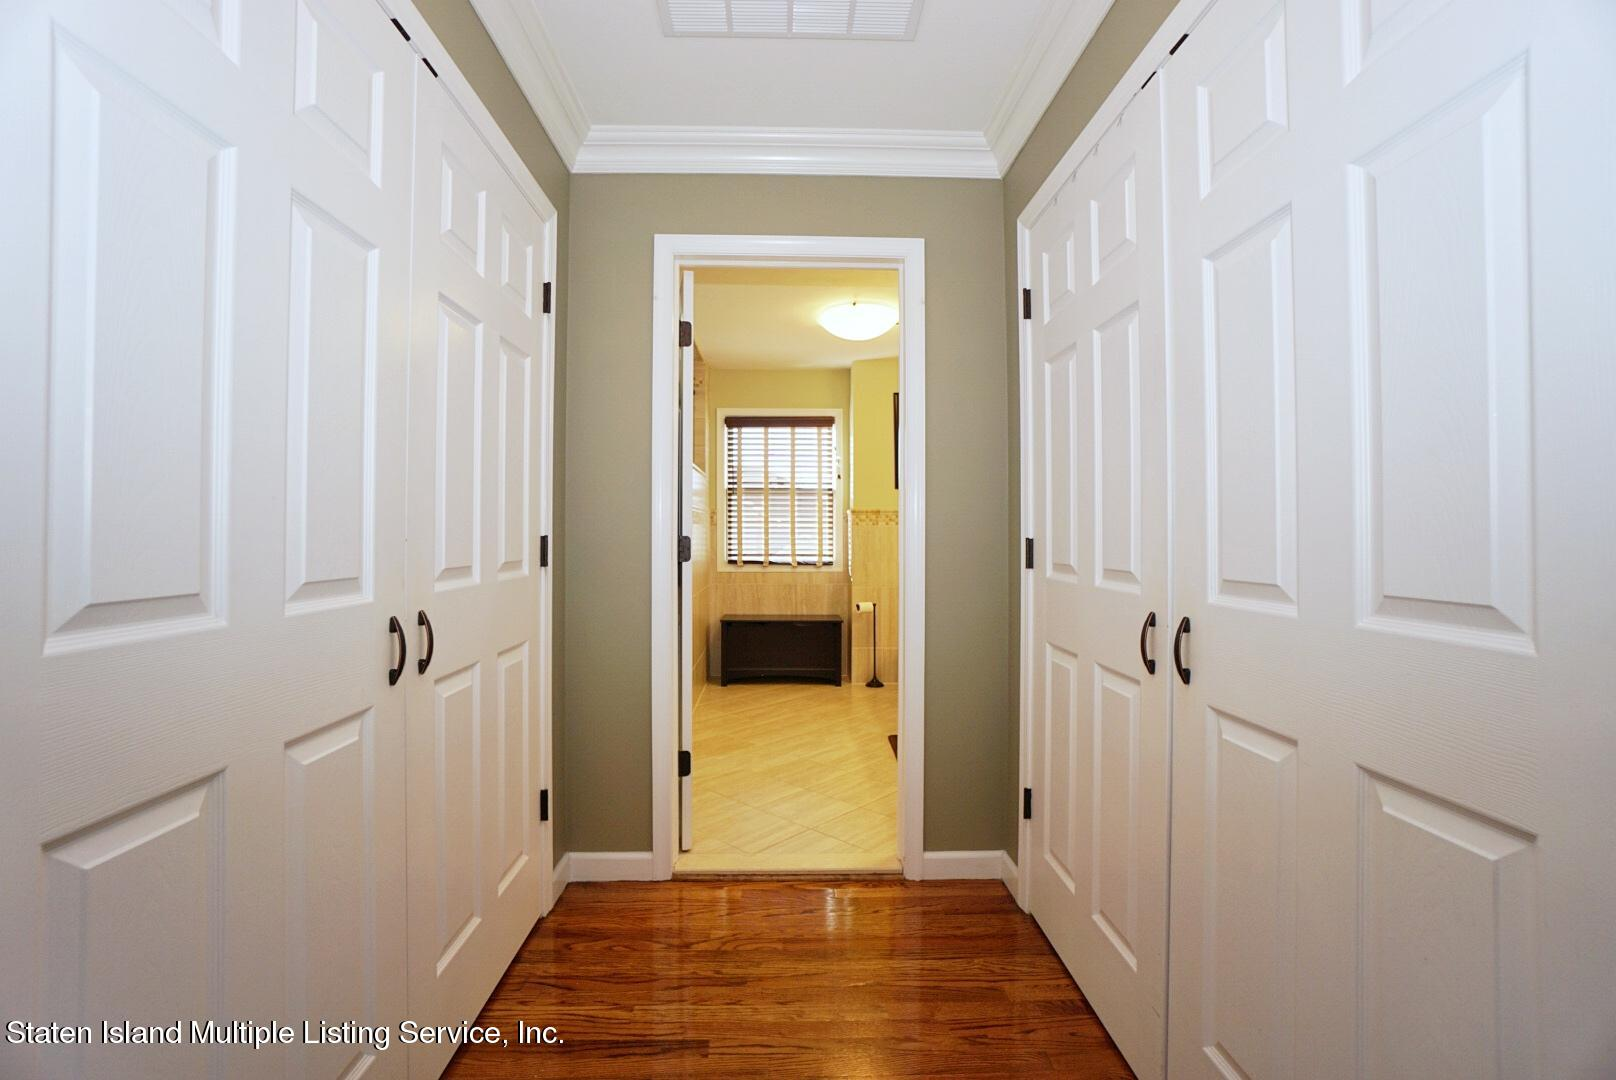 Single Family - Detached 31 Belwood Loop  Staten Island, NY 10307, MLS-1143133-33